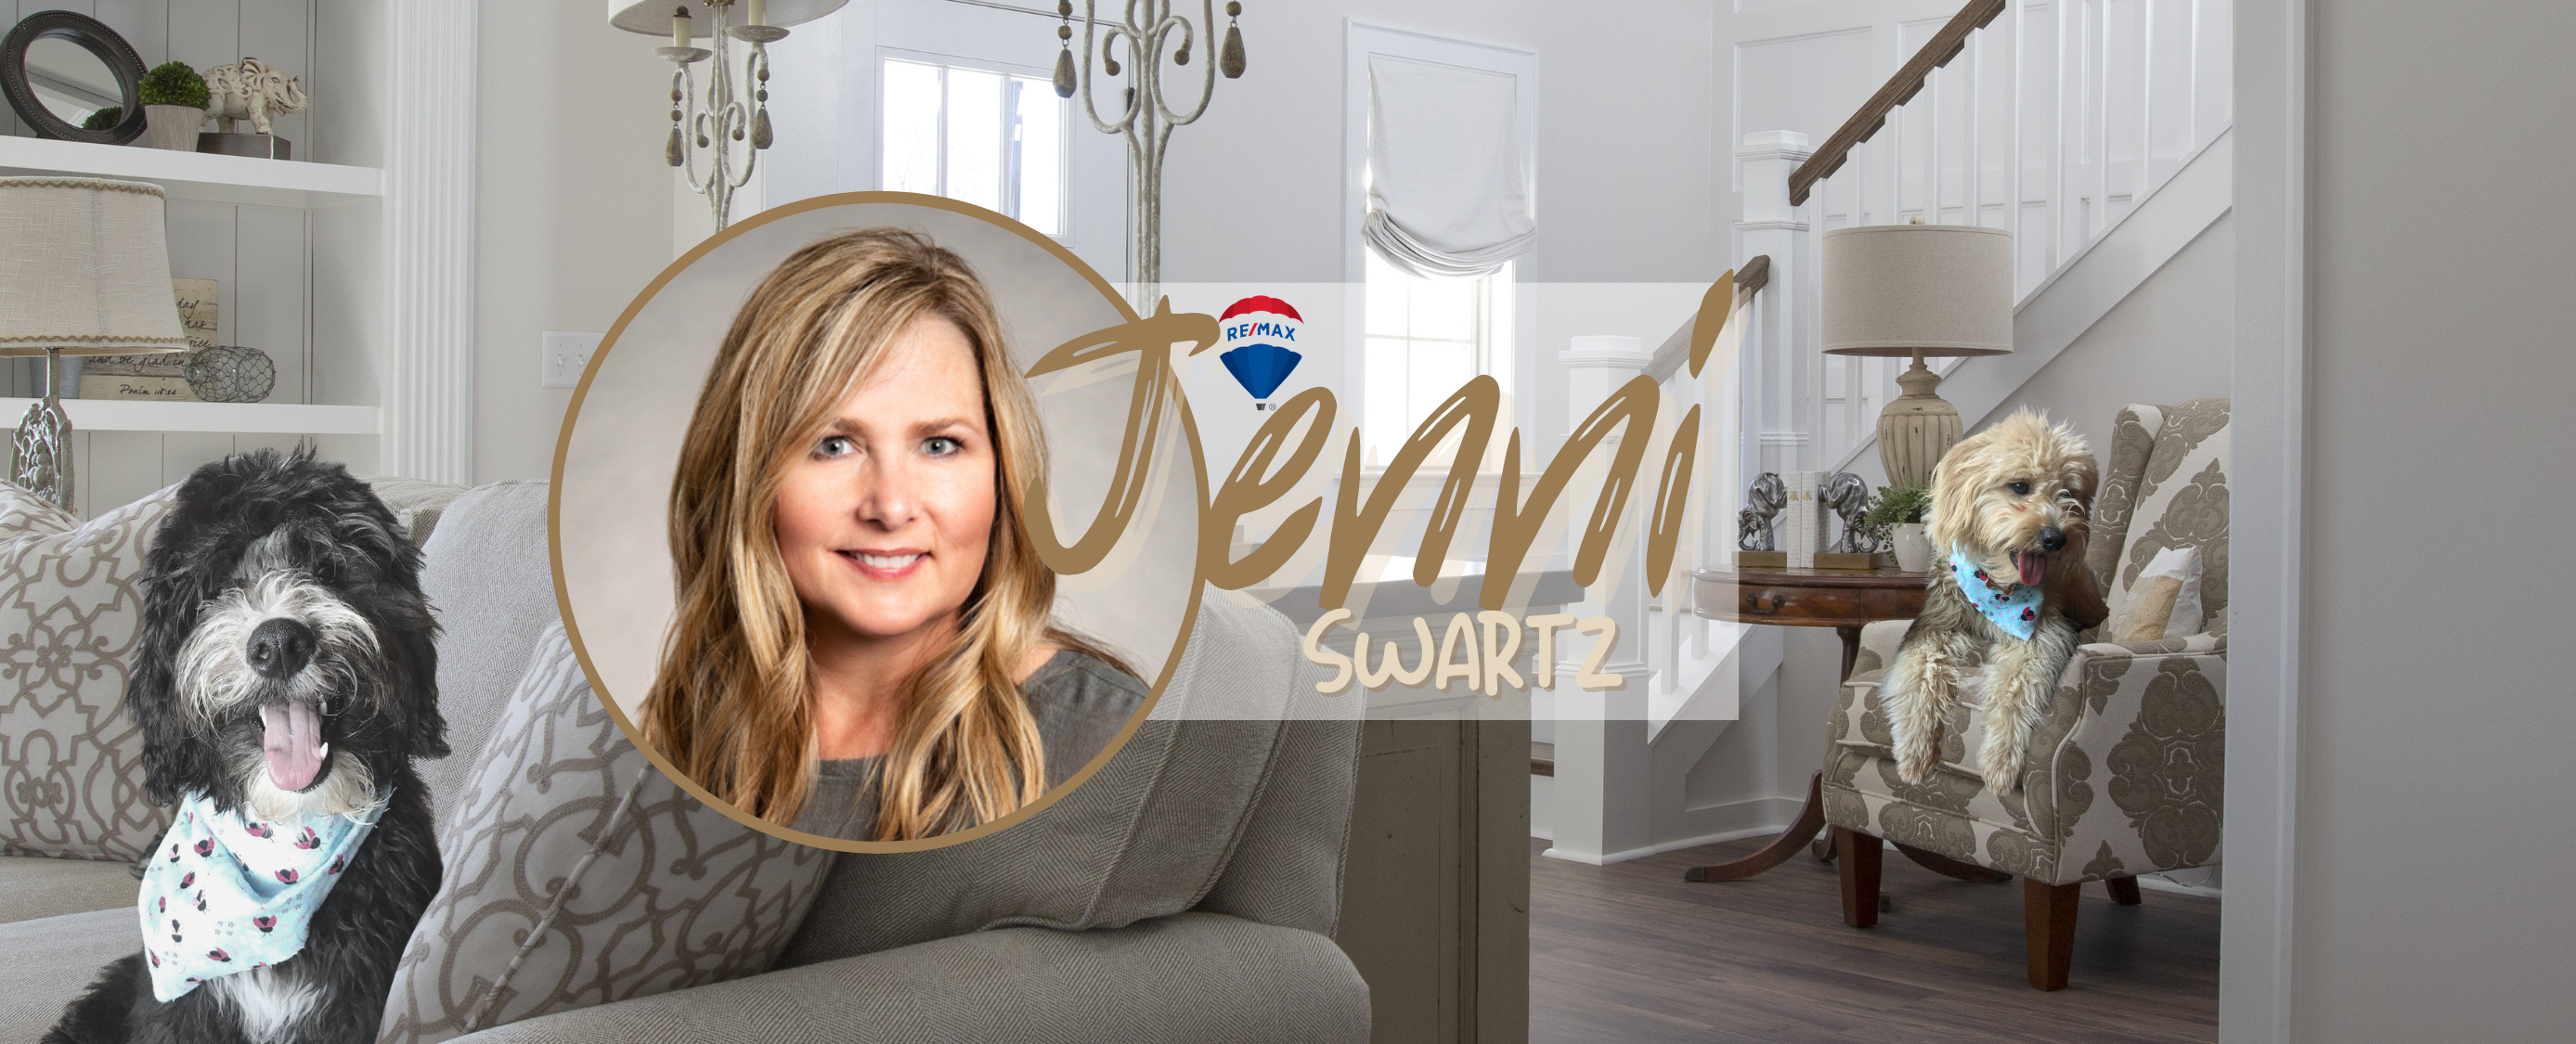 Jenni Swartz REMAX of Helena